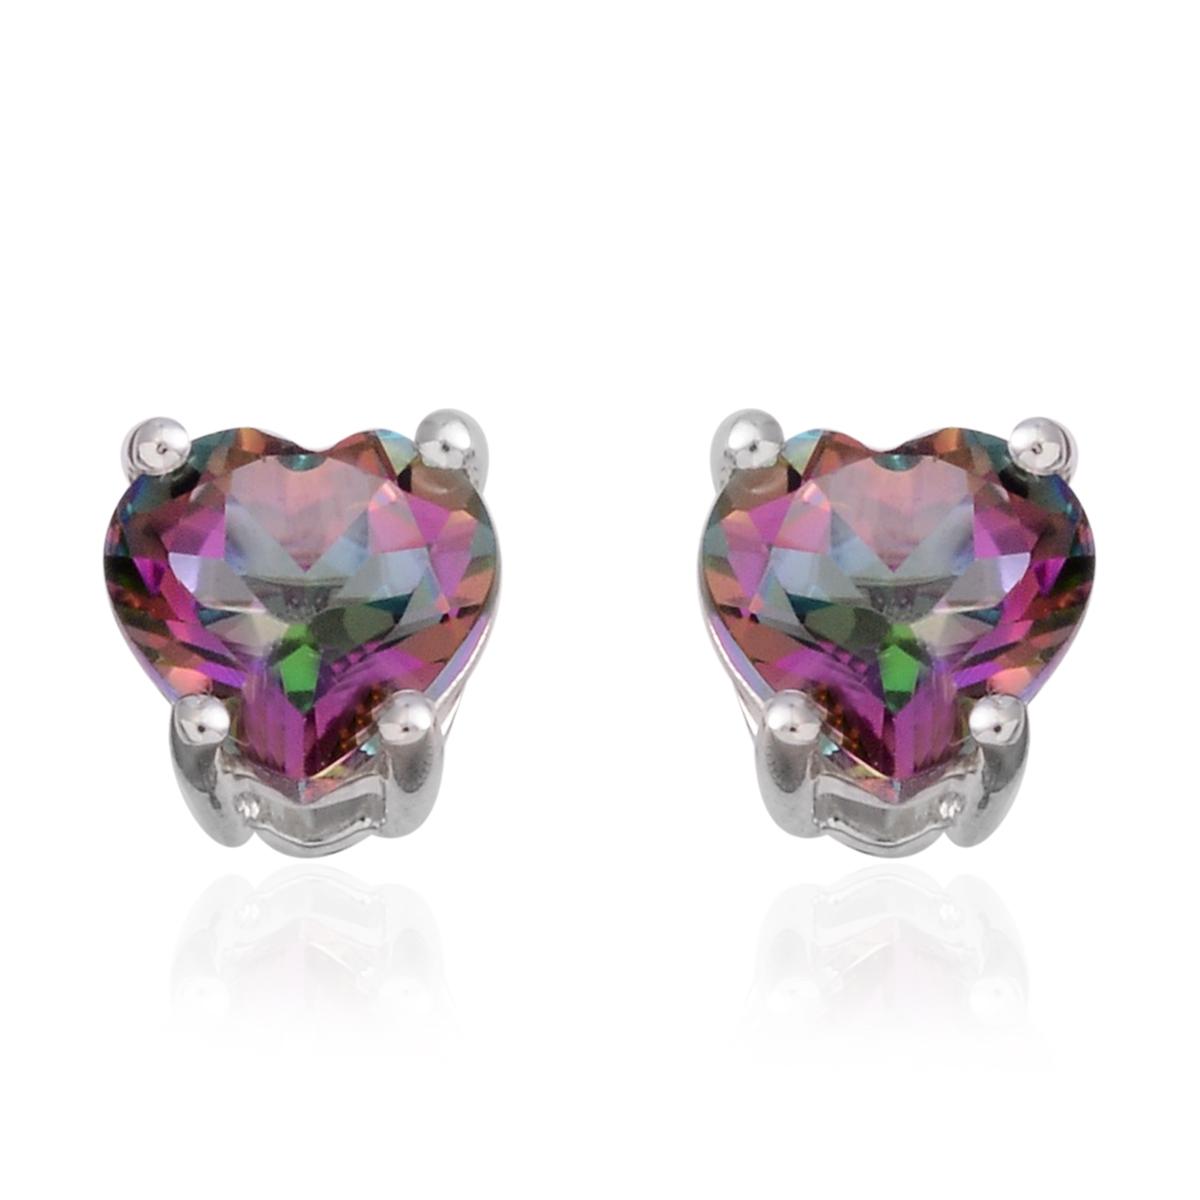 dbdfd86cd Northern Lights Mystic Topaz Sterling Silver Heart Stud Earrings TGW 1.84  cts.   Solitaire   Earrings   Jewelry   online-store   Shop LC